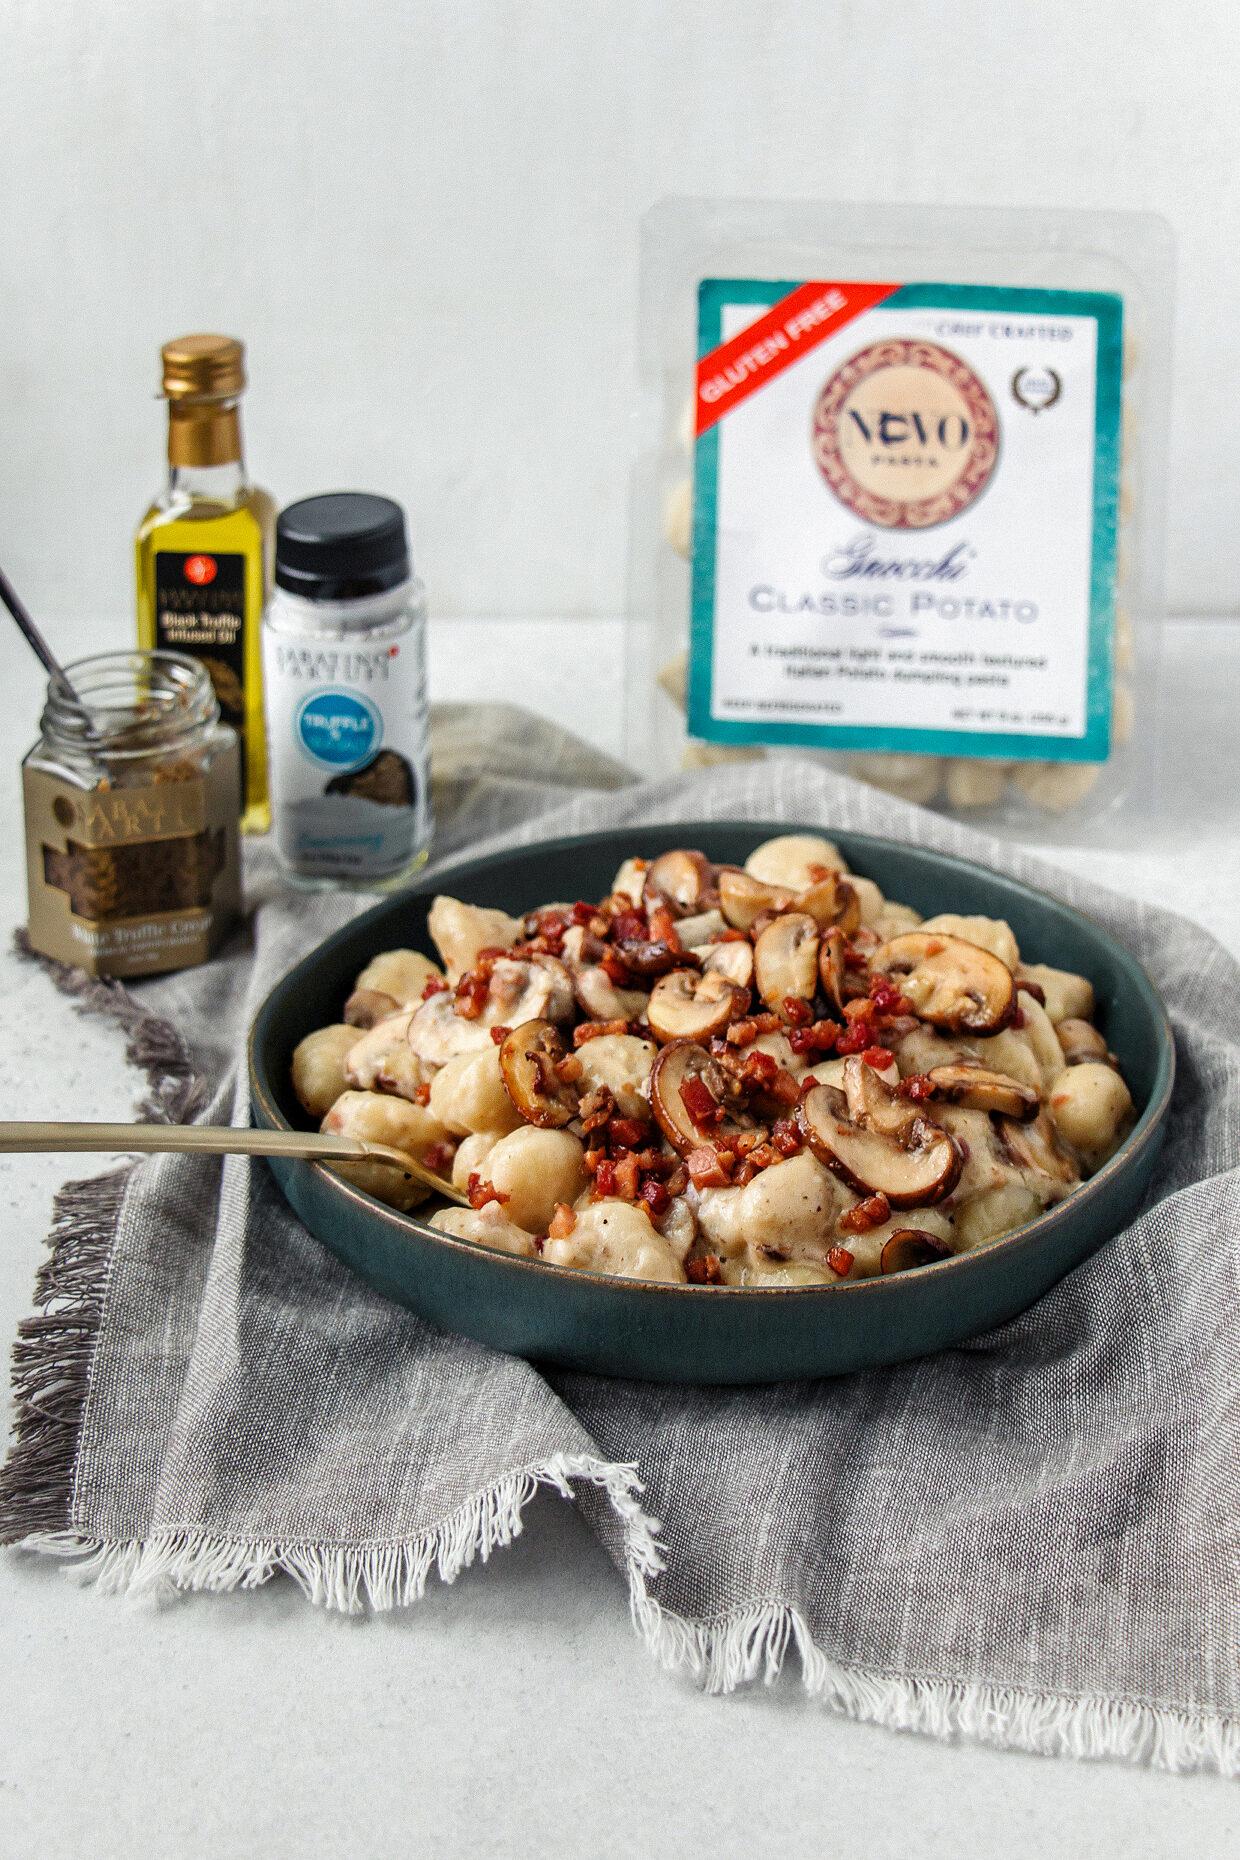 Gnocchi with Creamy Mushroom Pancetta Truffle Sauce